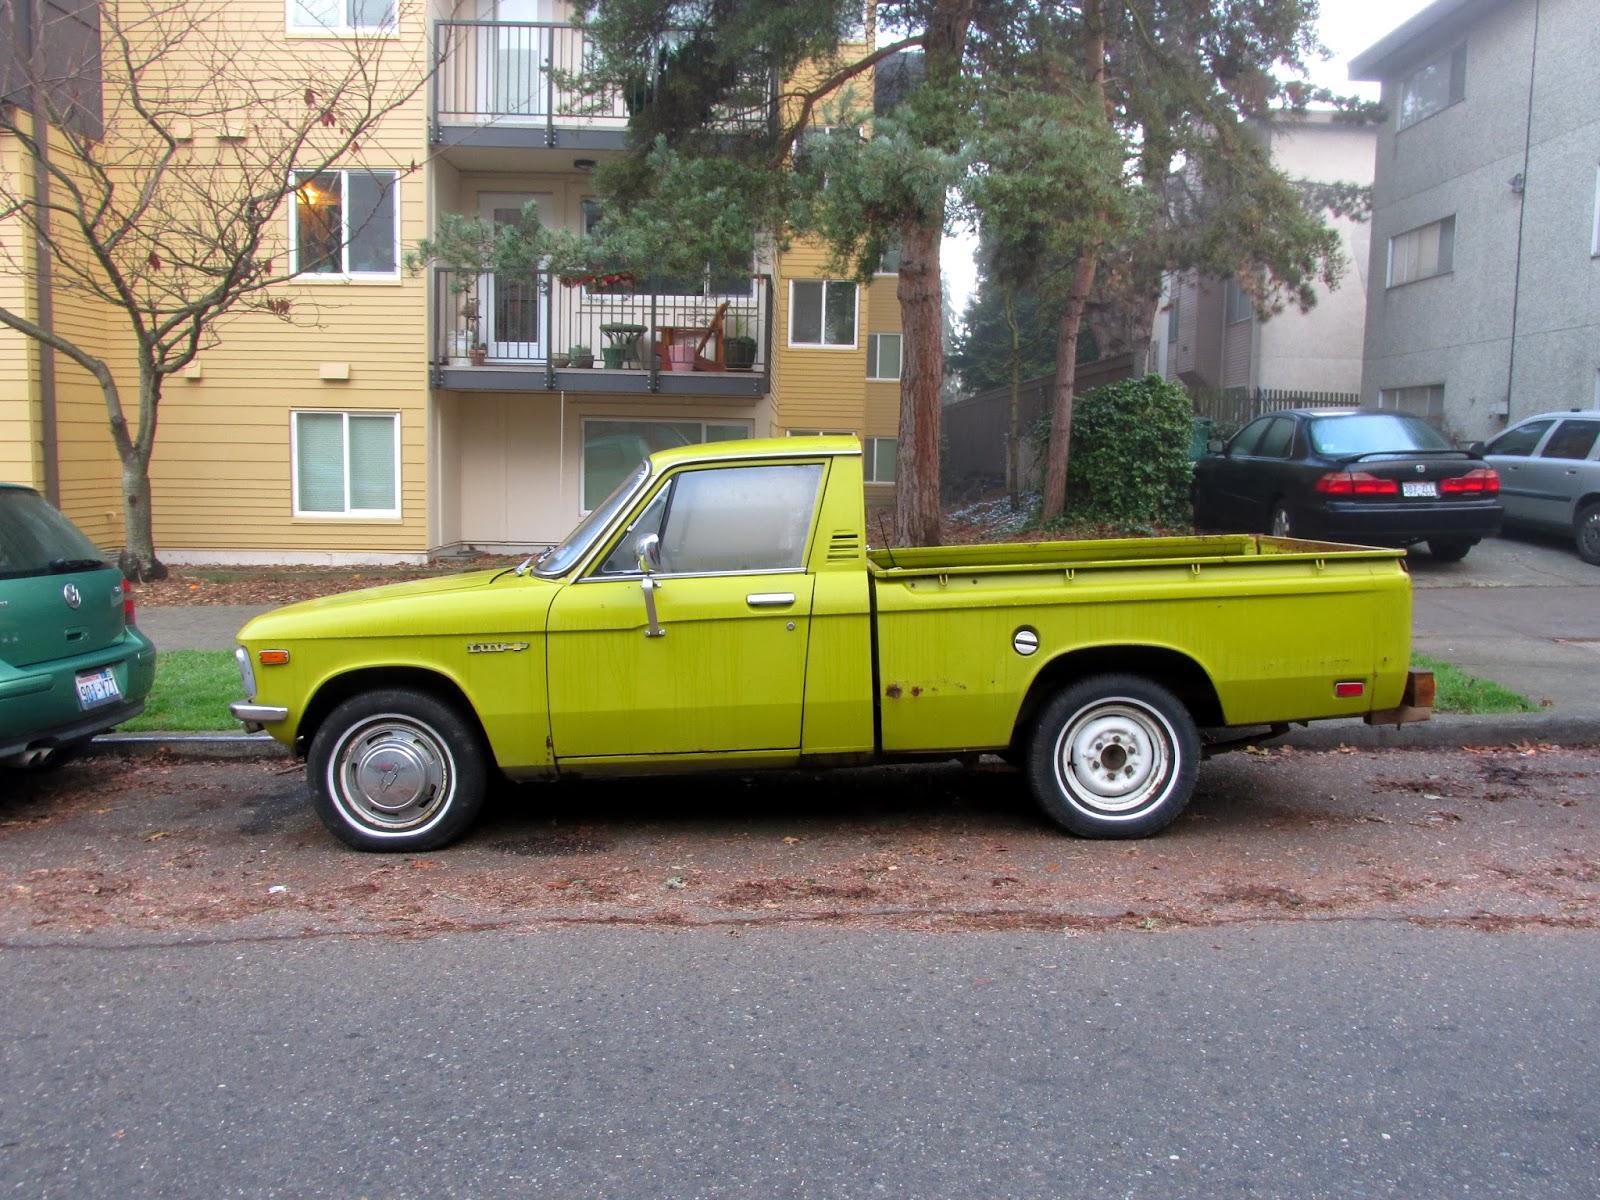 seattle\u0027s classics 1973 chevrolet luv pickup1973 chevrolet luv pickup